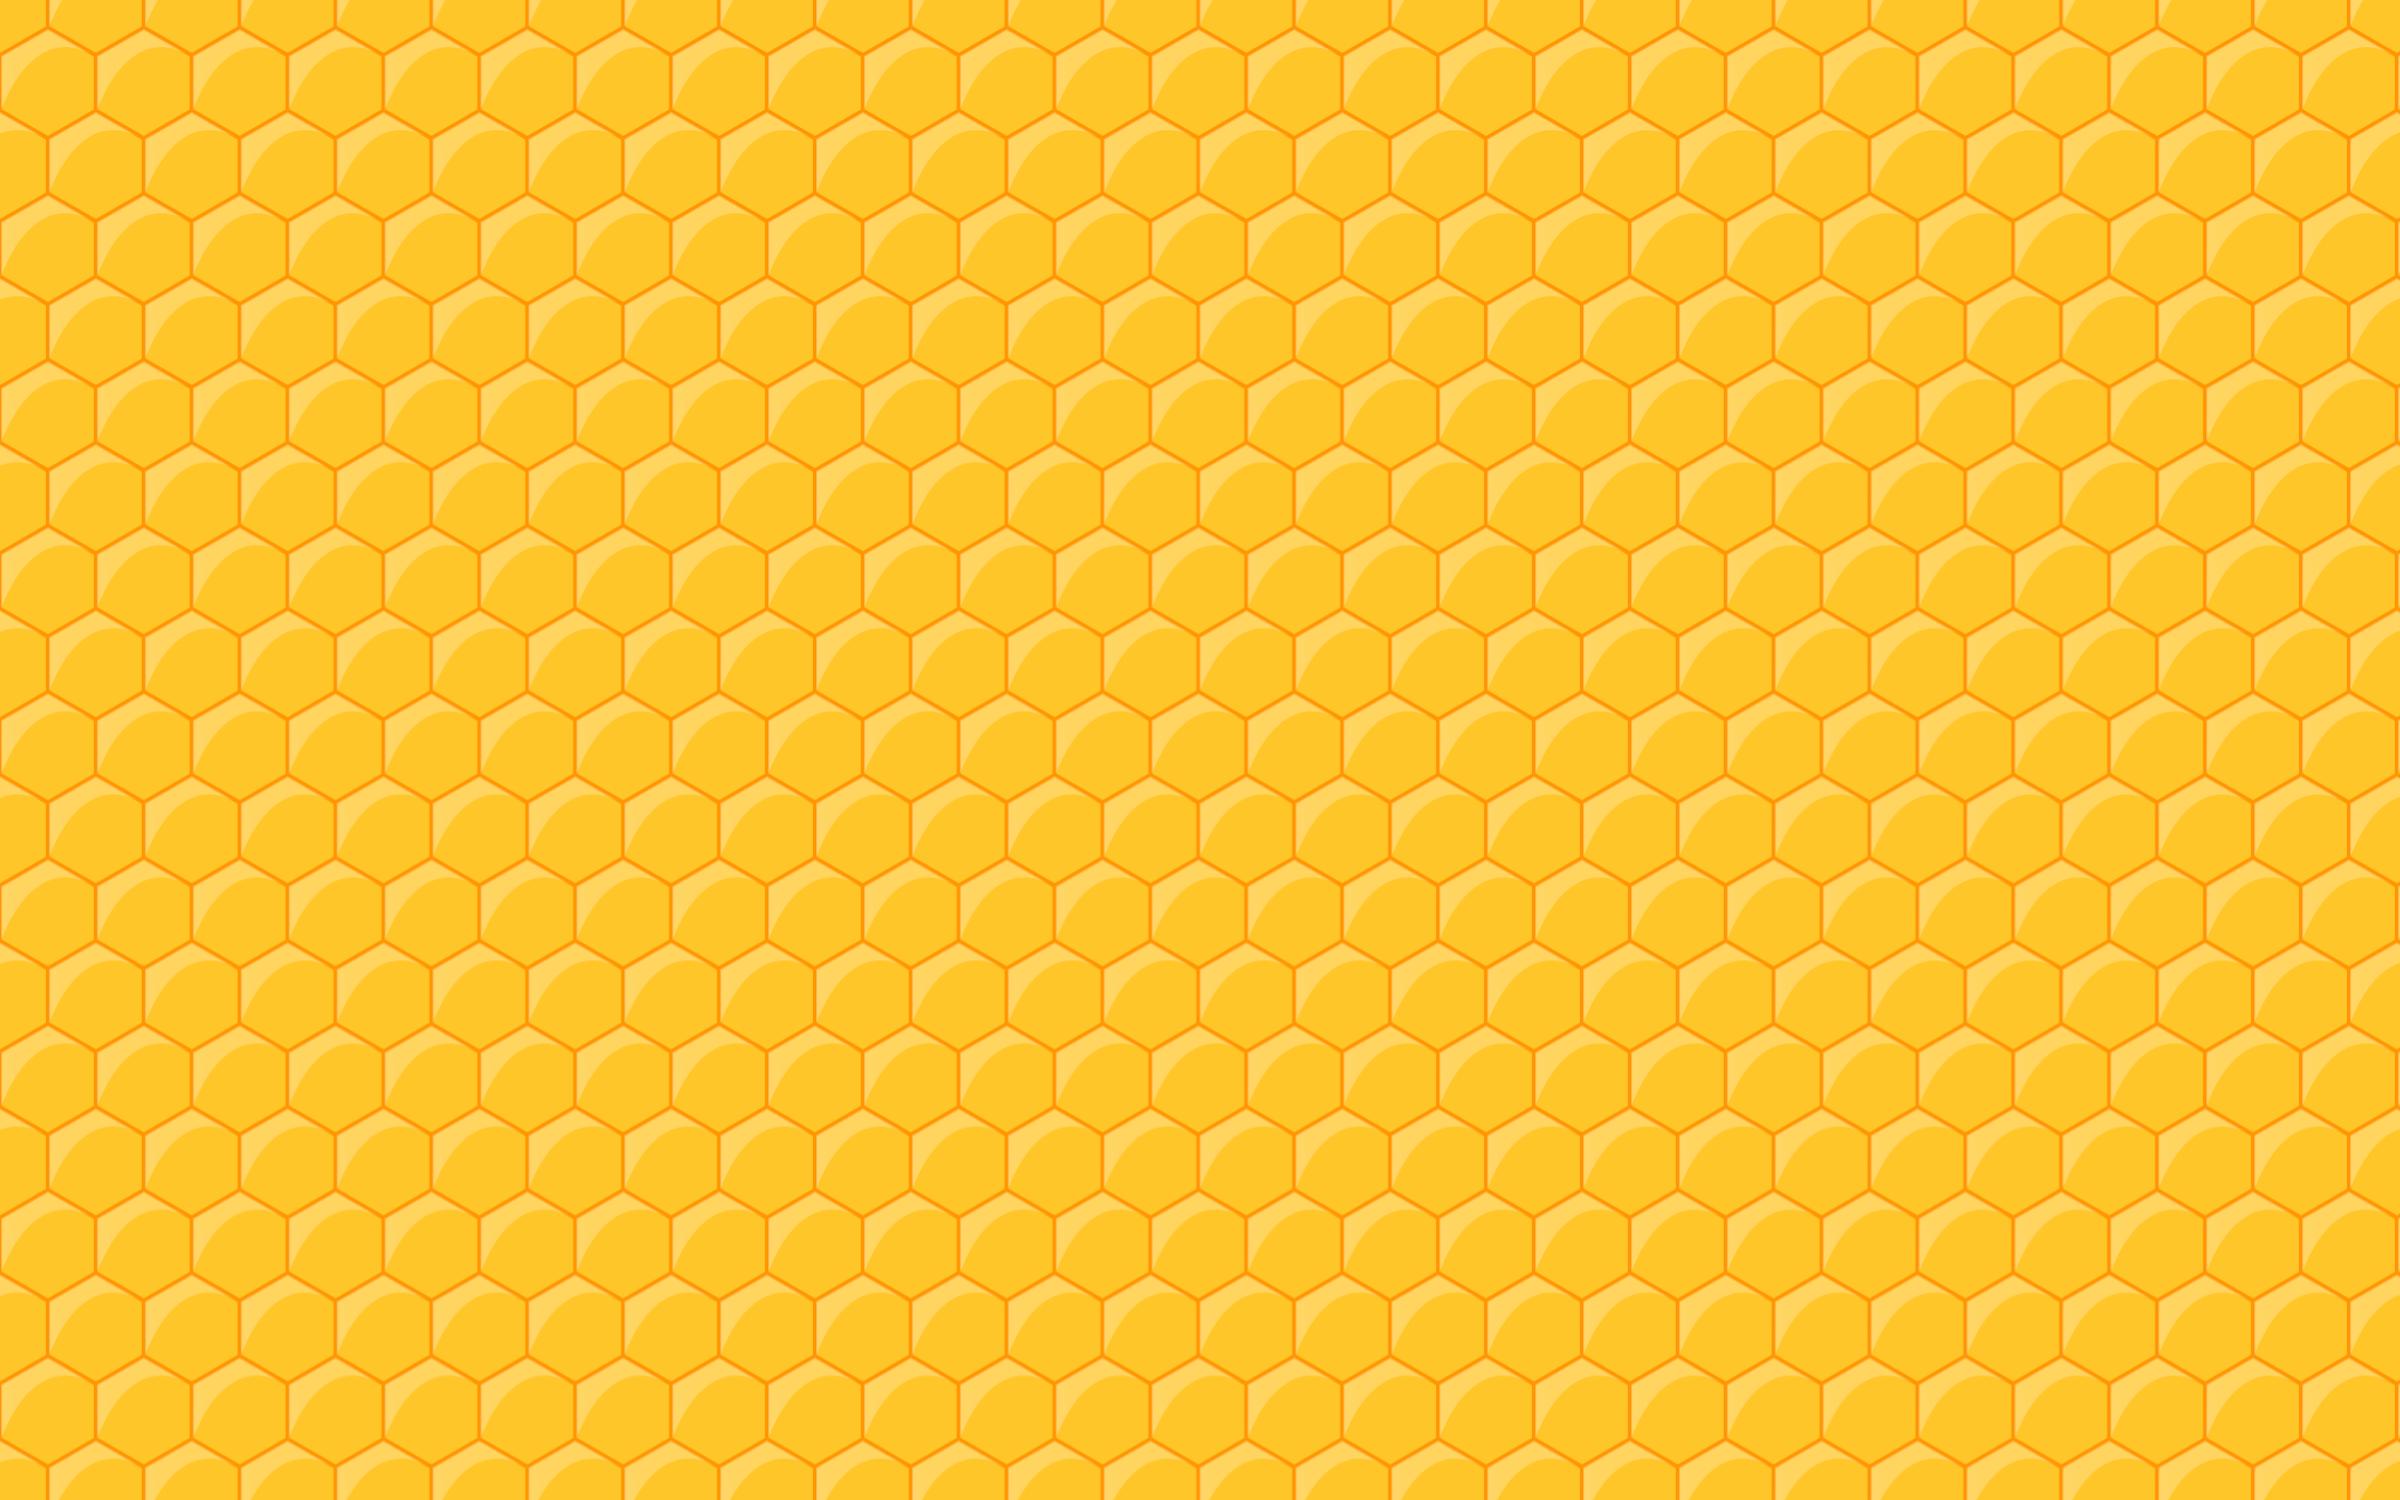 Clipart - Seamless Honeycomb Pattern